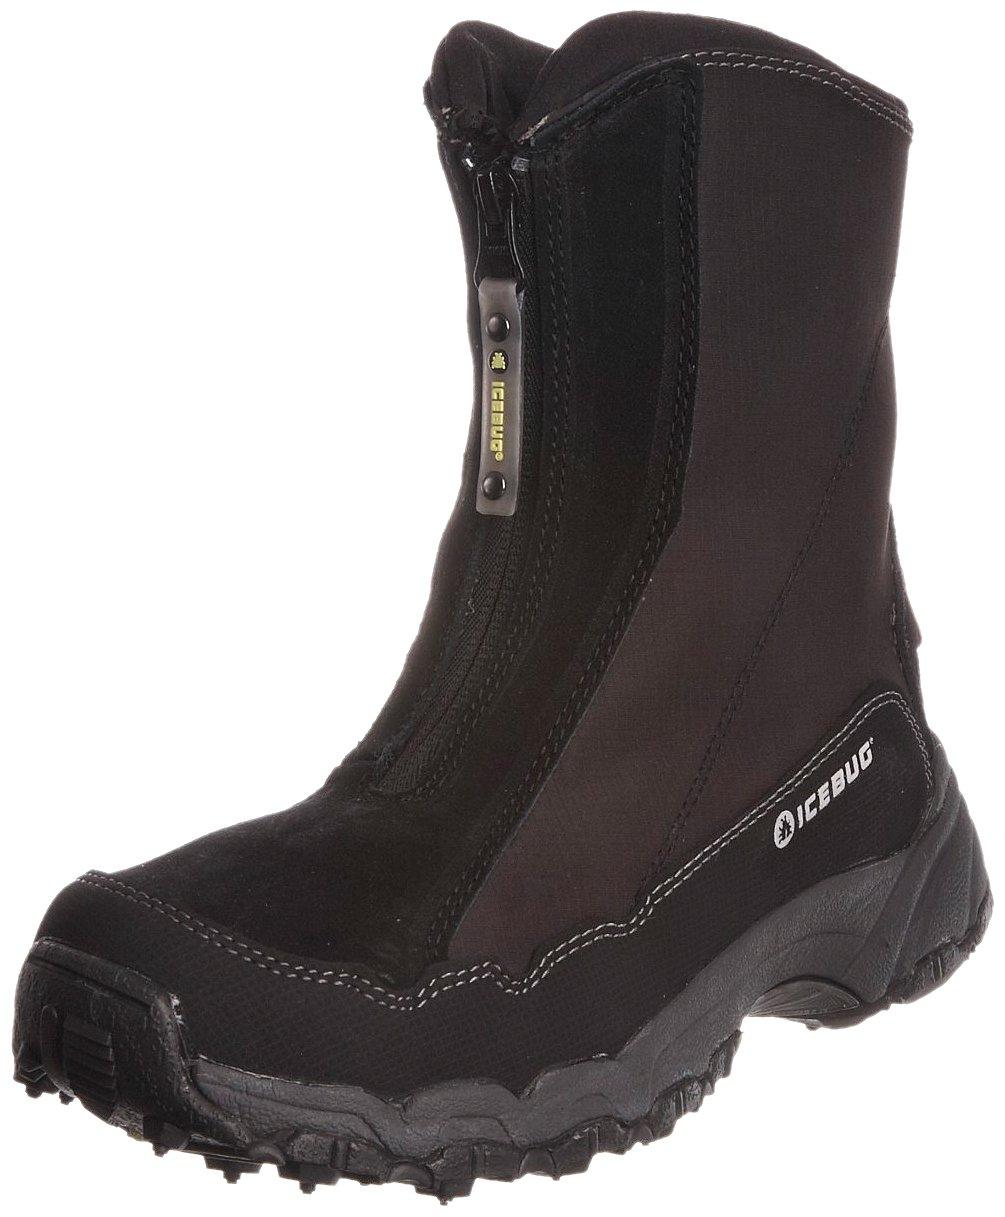 Icebug Women's Ivalo BUGrip Studded Traction Winter Boot B003CC0XSC 5.5 B(M) US Black